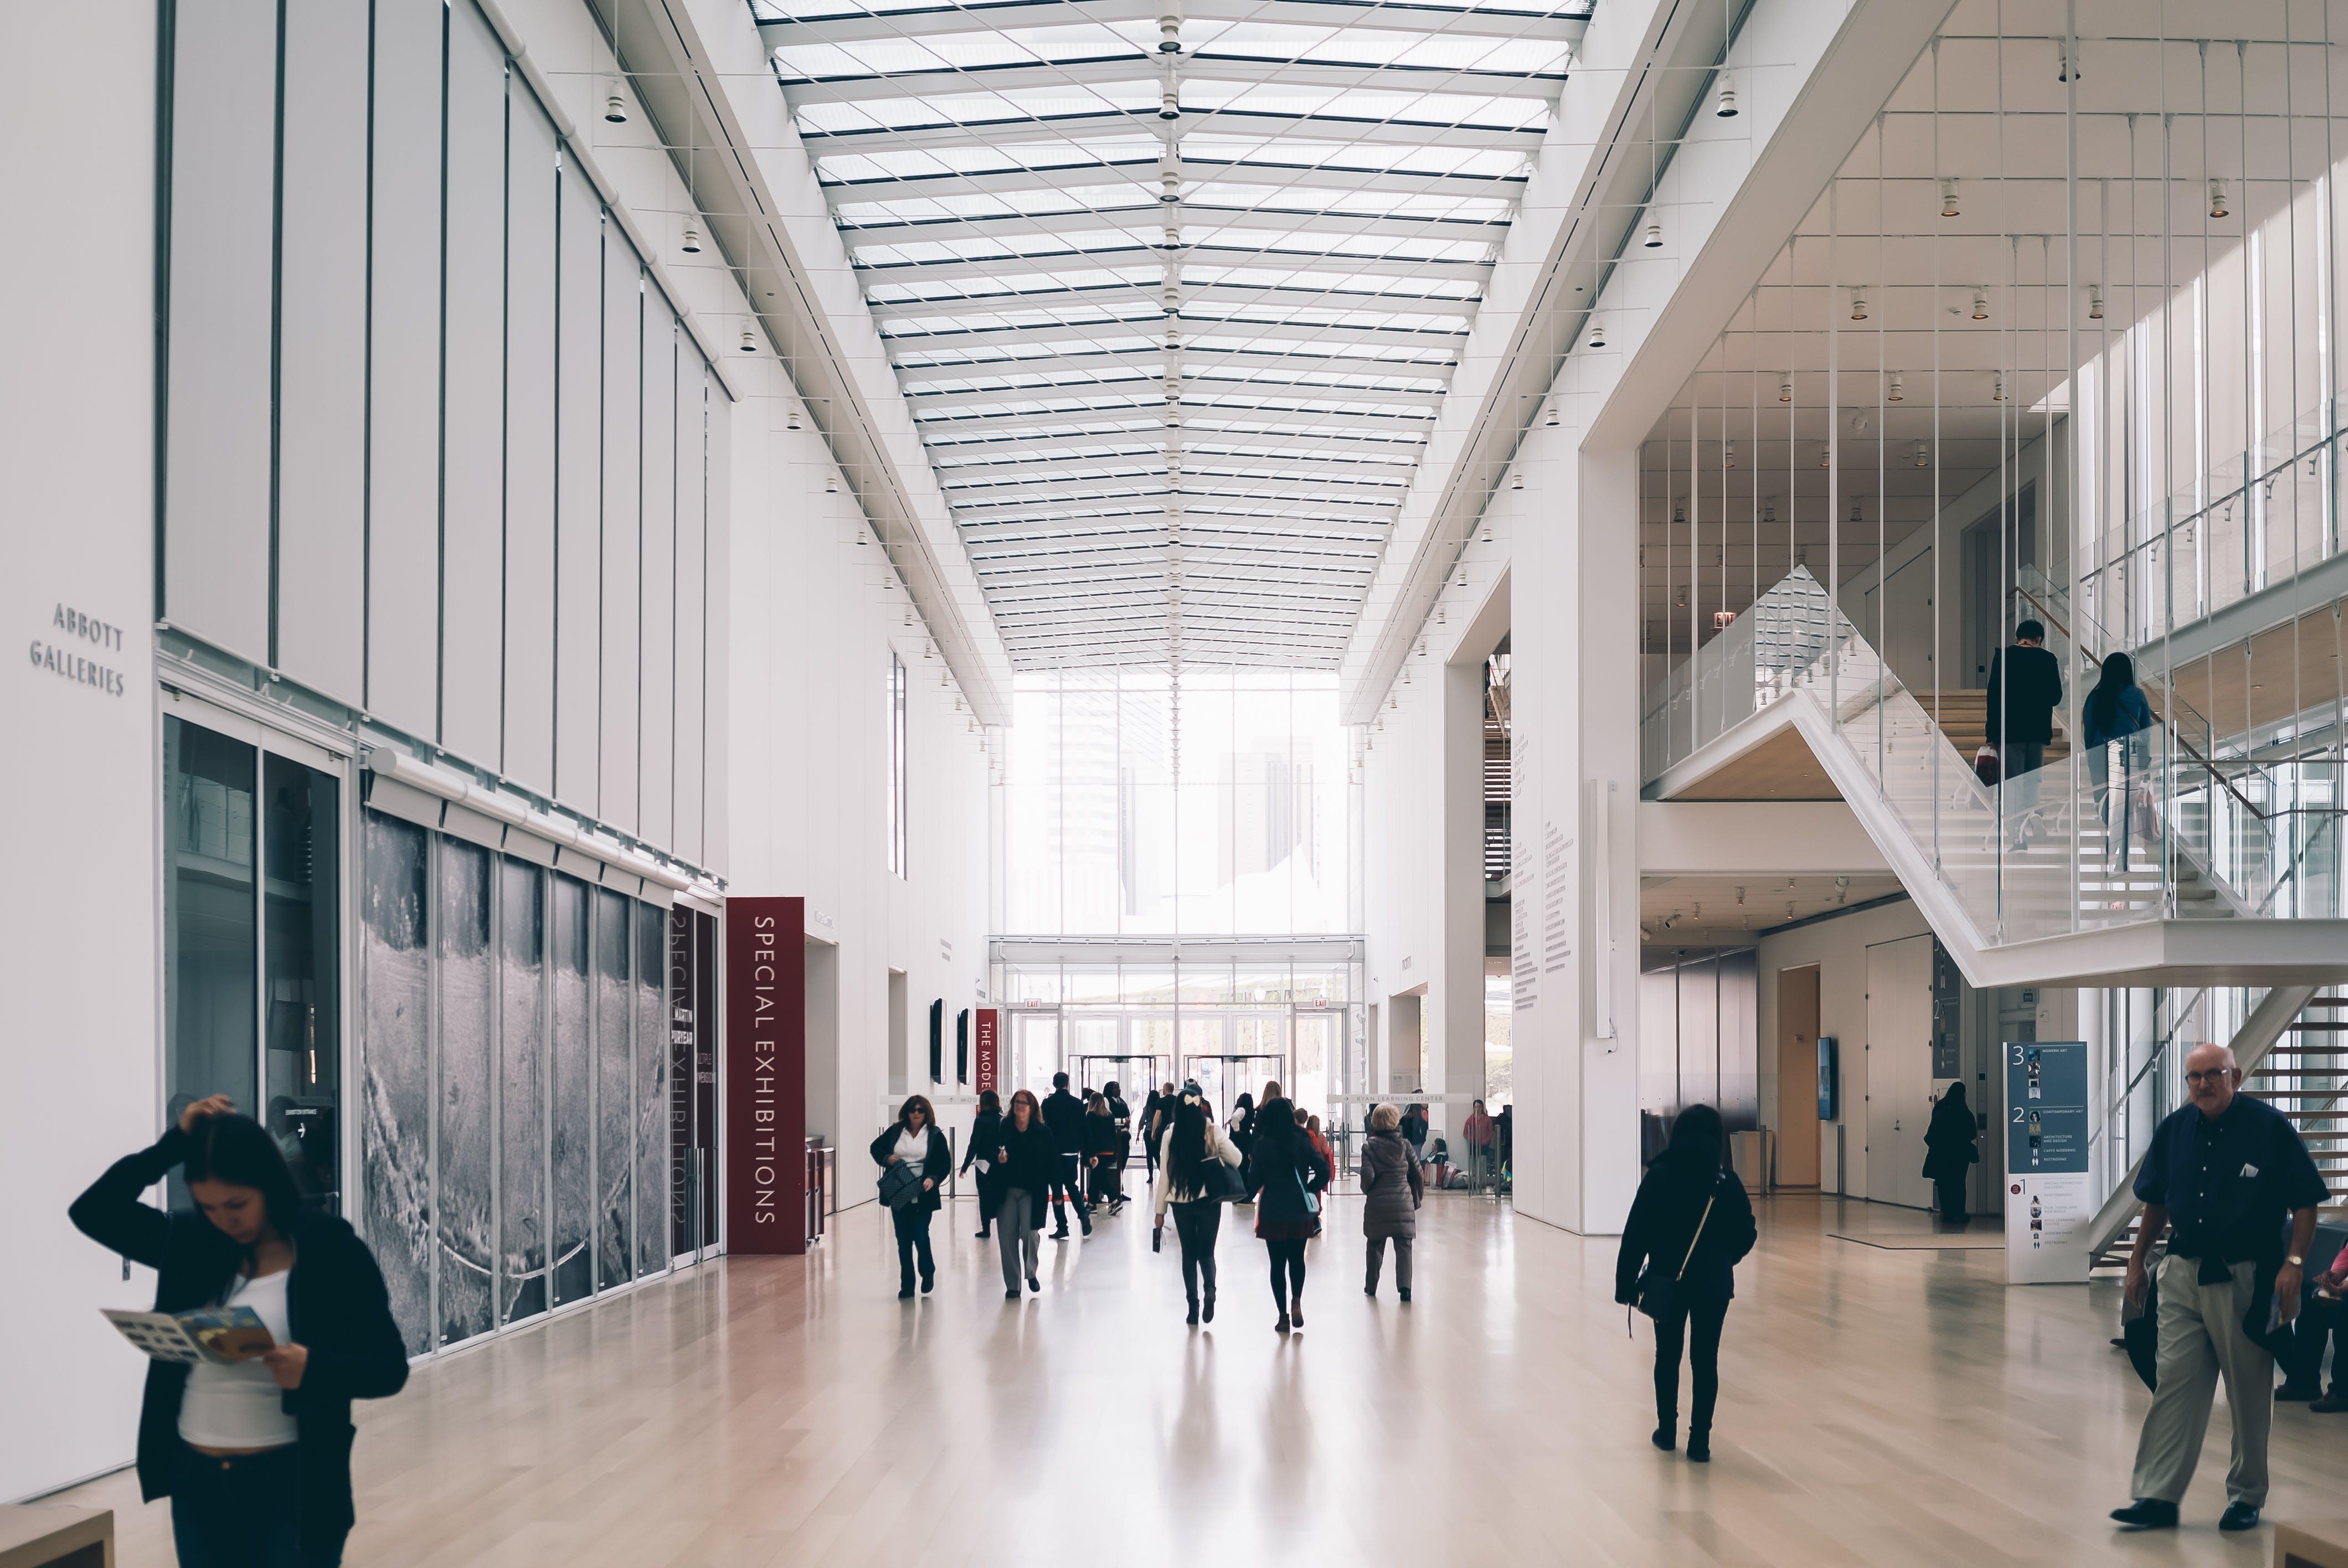 People Along Hallway of Concrete Building